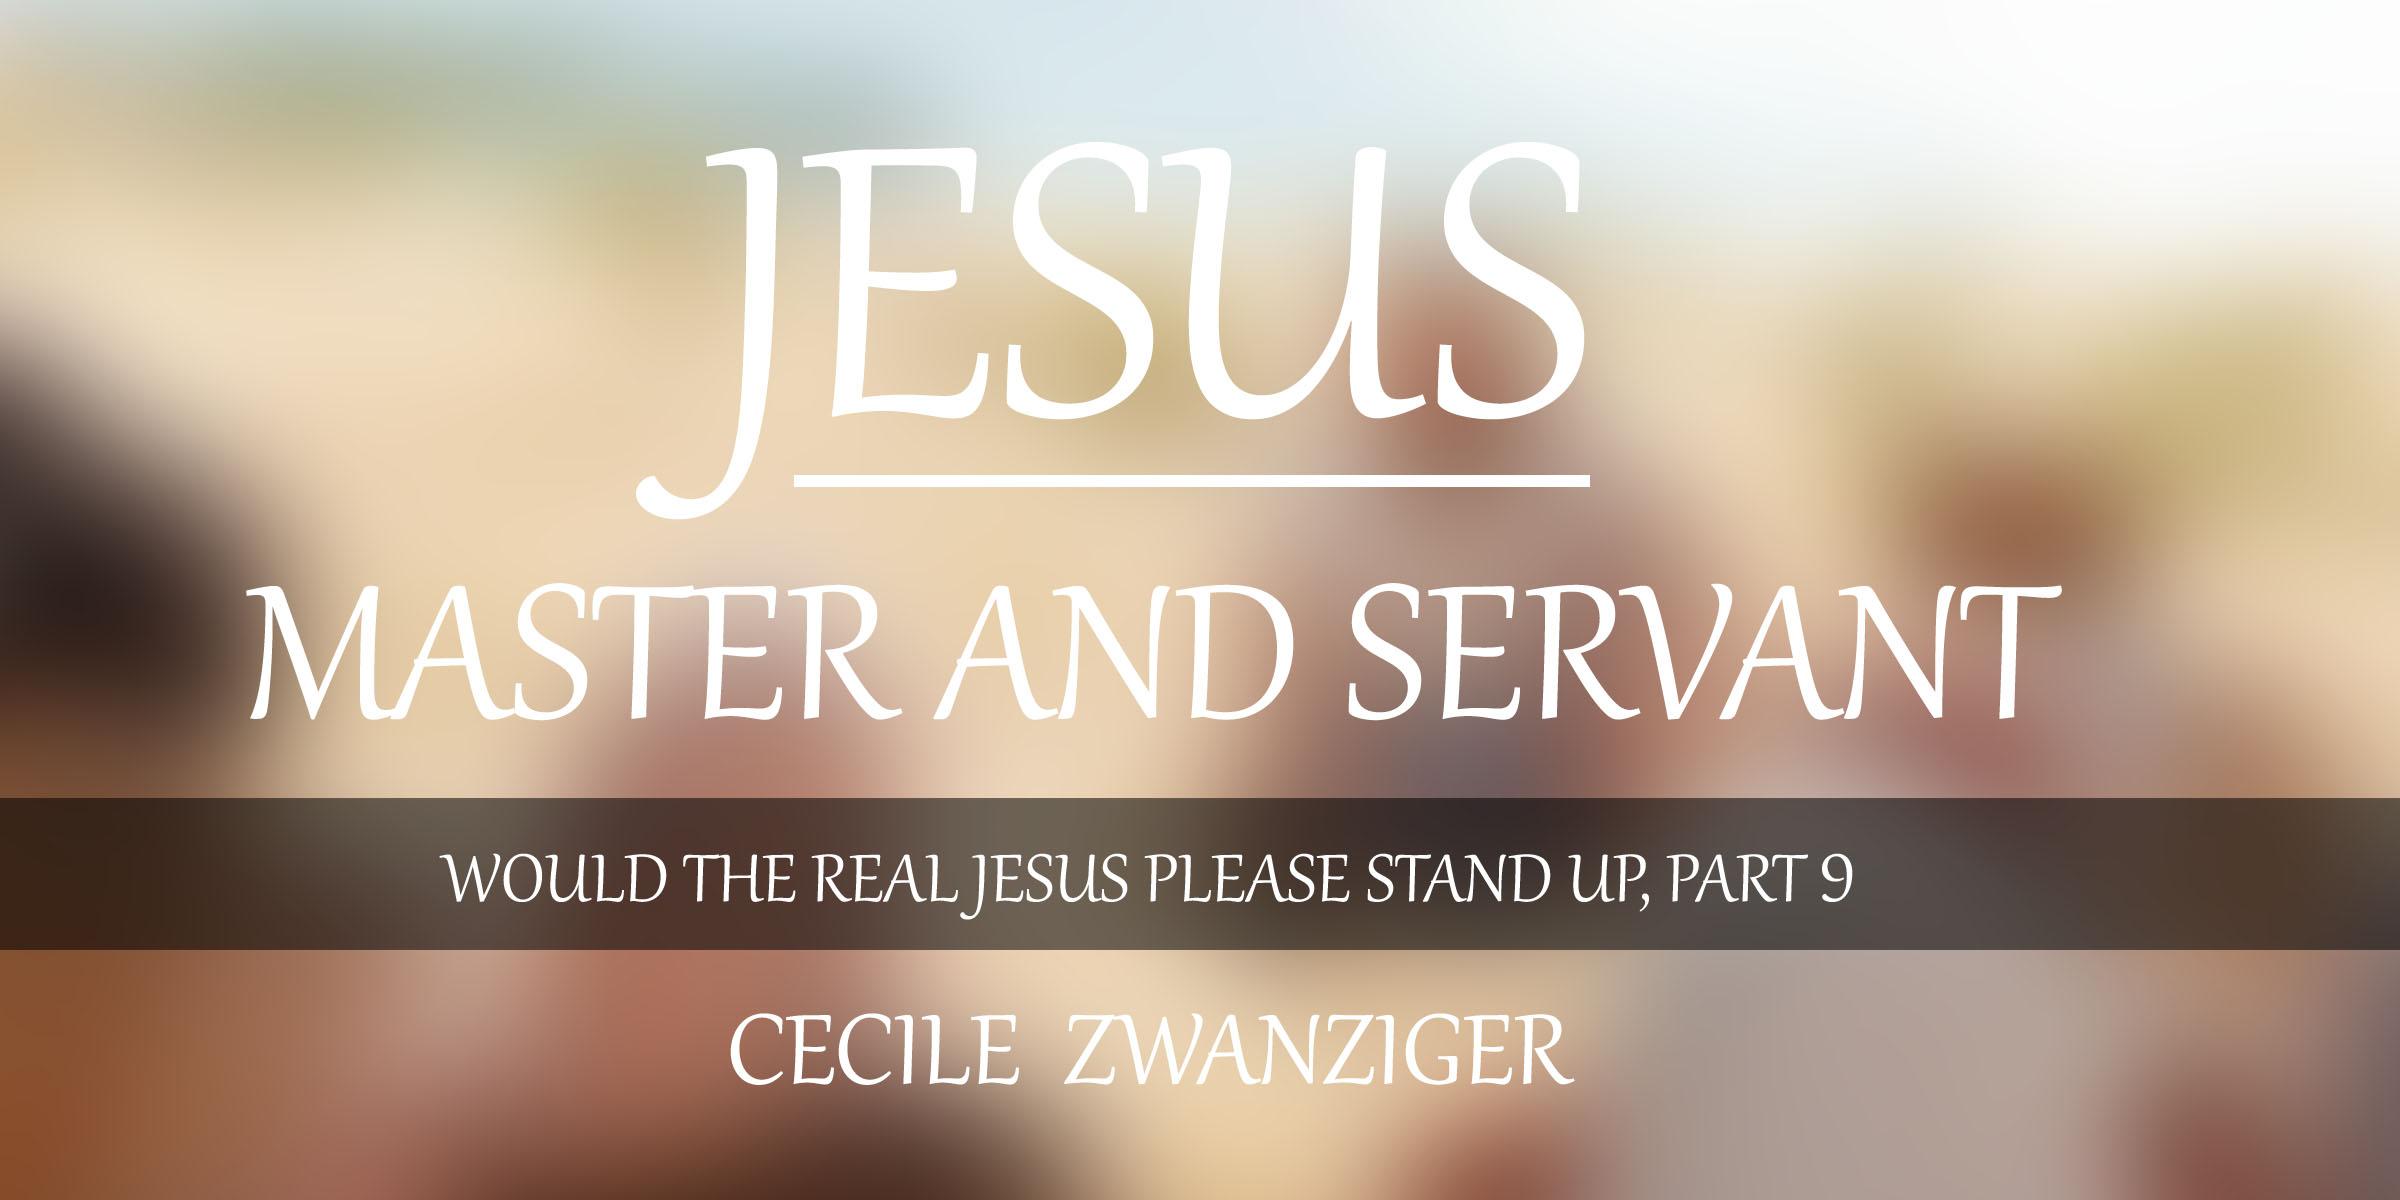 Jesus, Master and Servant